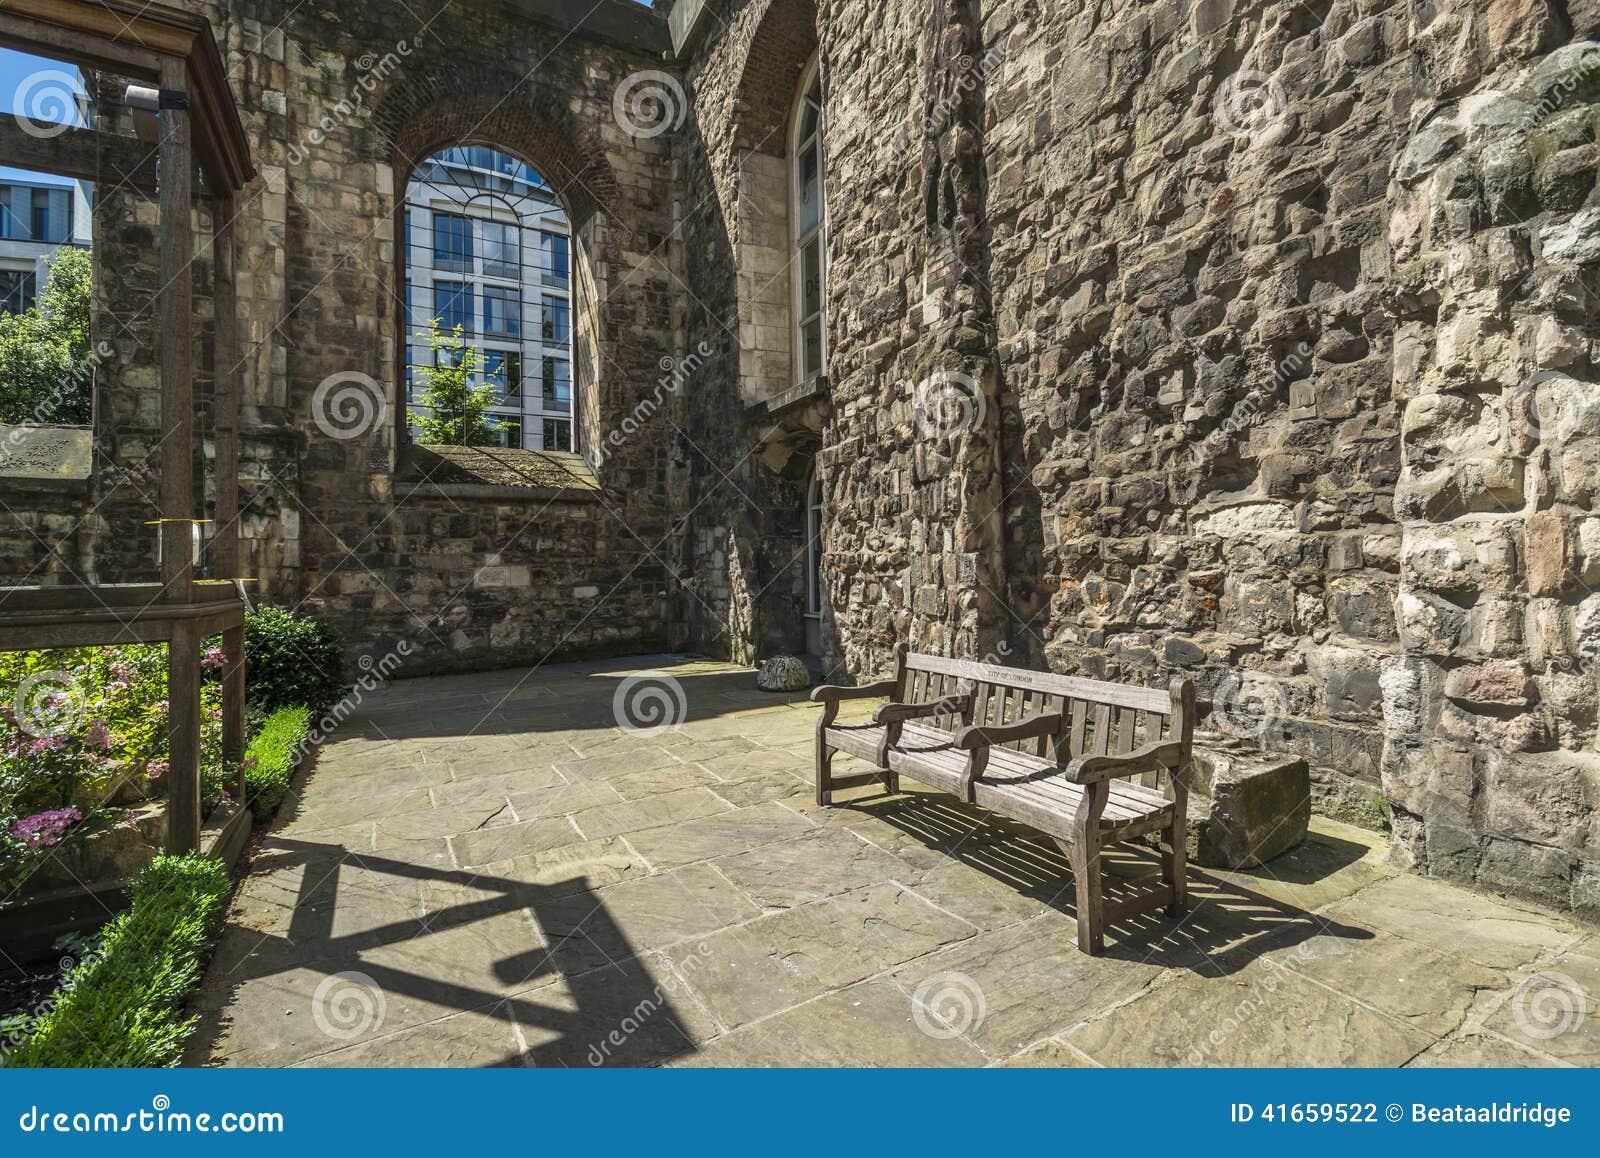 Сад Крайстчёрча Greyfriars в Лондоне